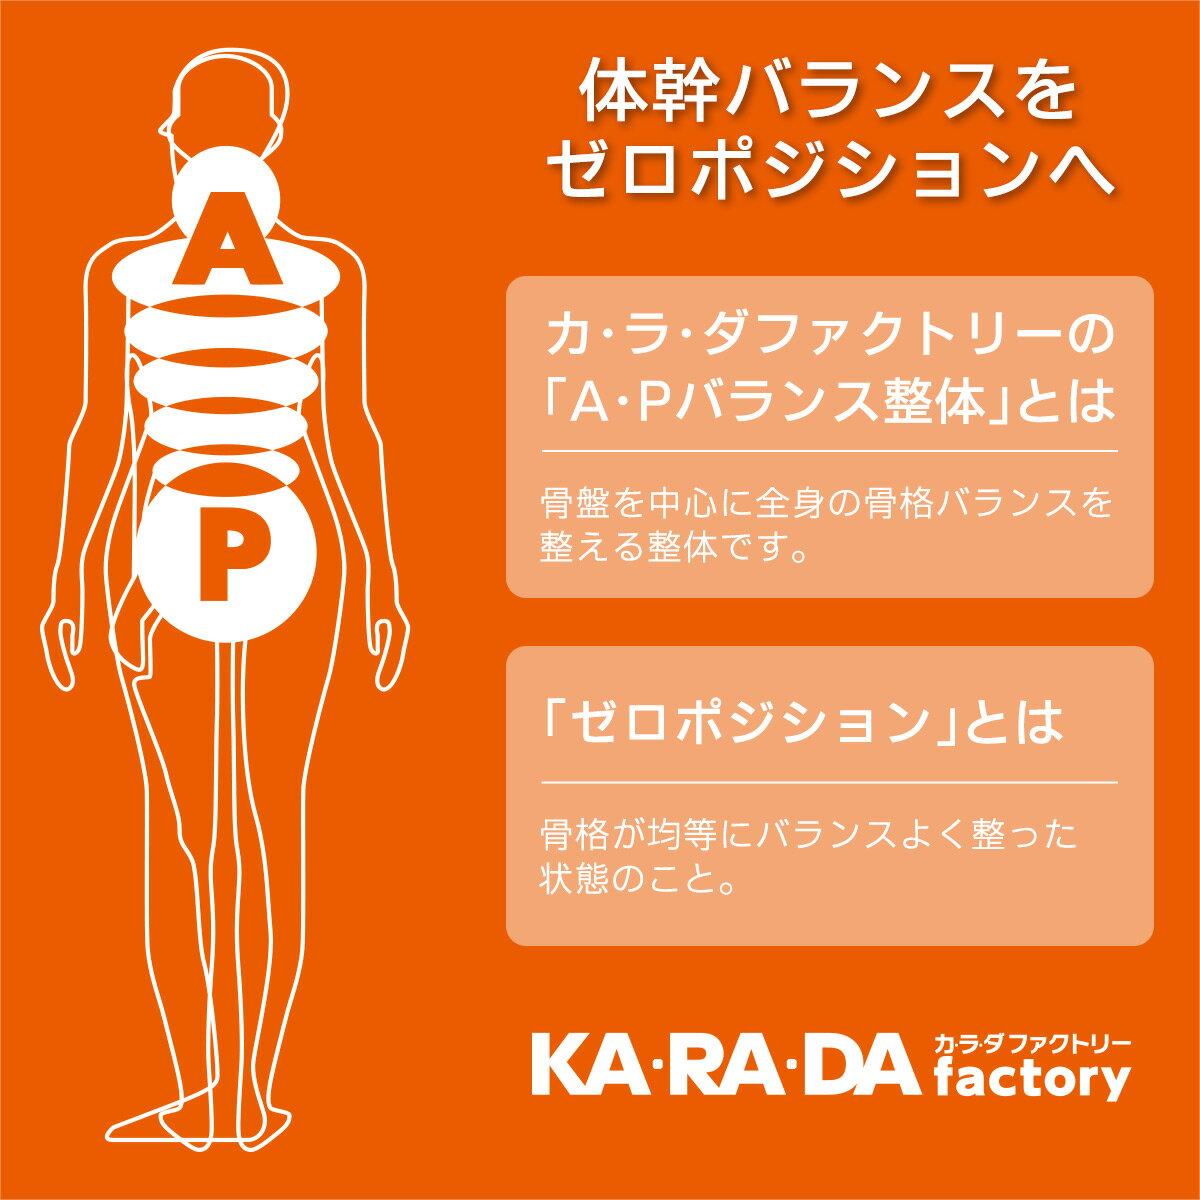 KARADAファクトリー(カラダファクトリー) 背筋スッキリ! 体幹安定ですっきりした立ち姿に 体幹調整ベルト レディース 女性 婦人 3171-001 【ゆうパケット・お取り扱い不可】